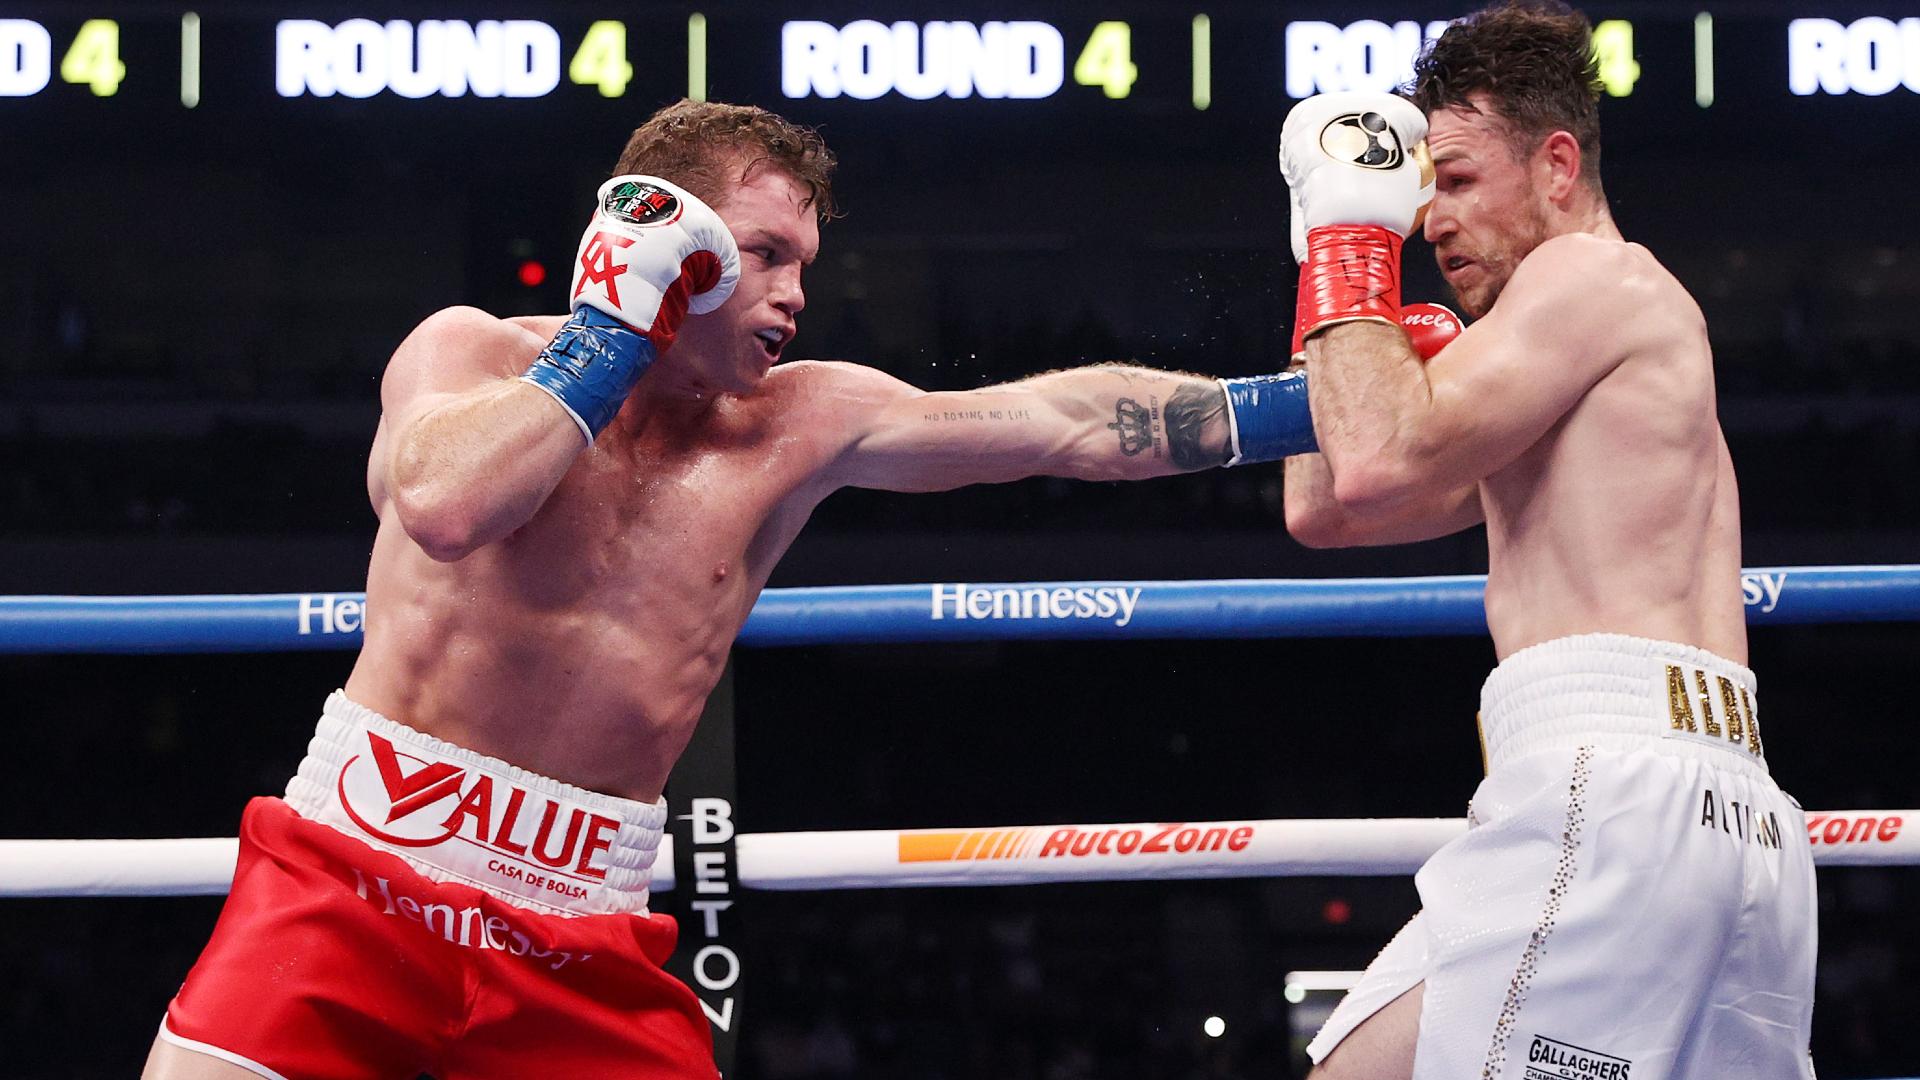 Alvarez dominates Smith to win super-middleweight titles